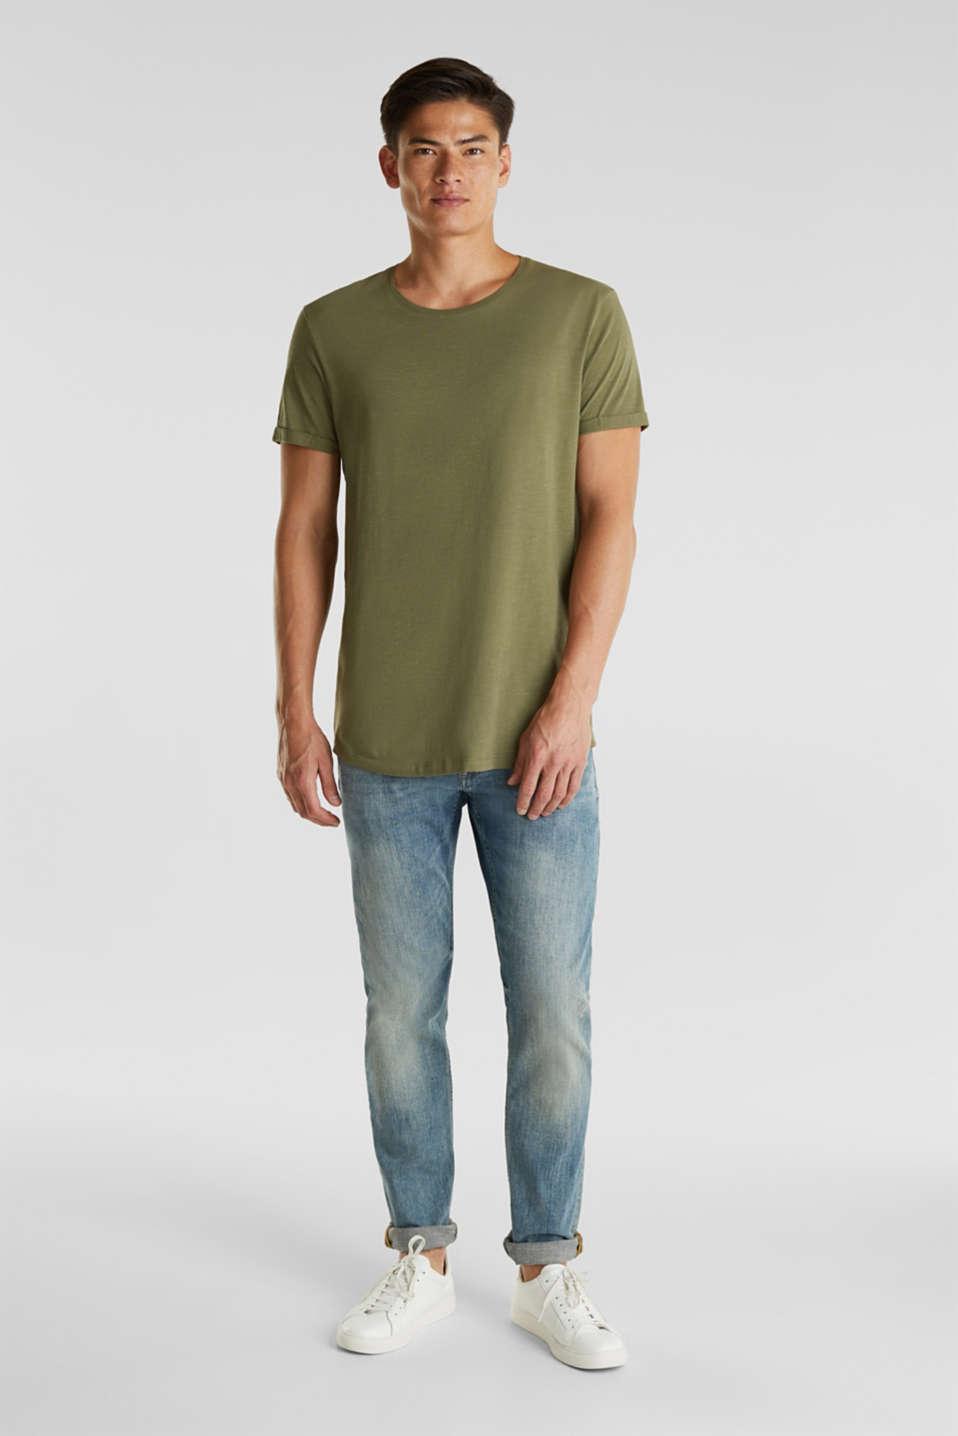 Jersey cotton top, KHAKI GREEN, detail image number 1